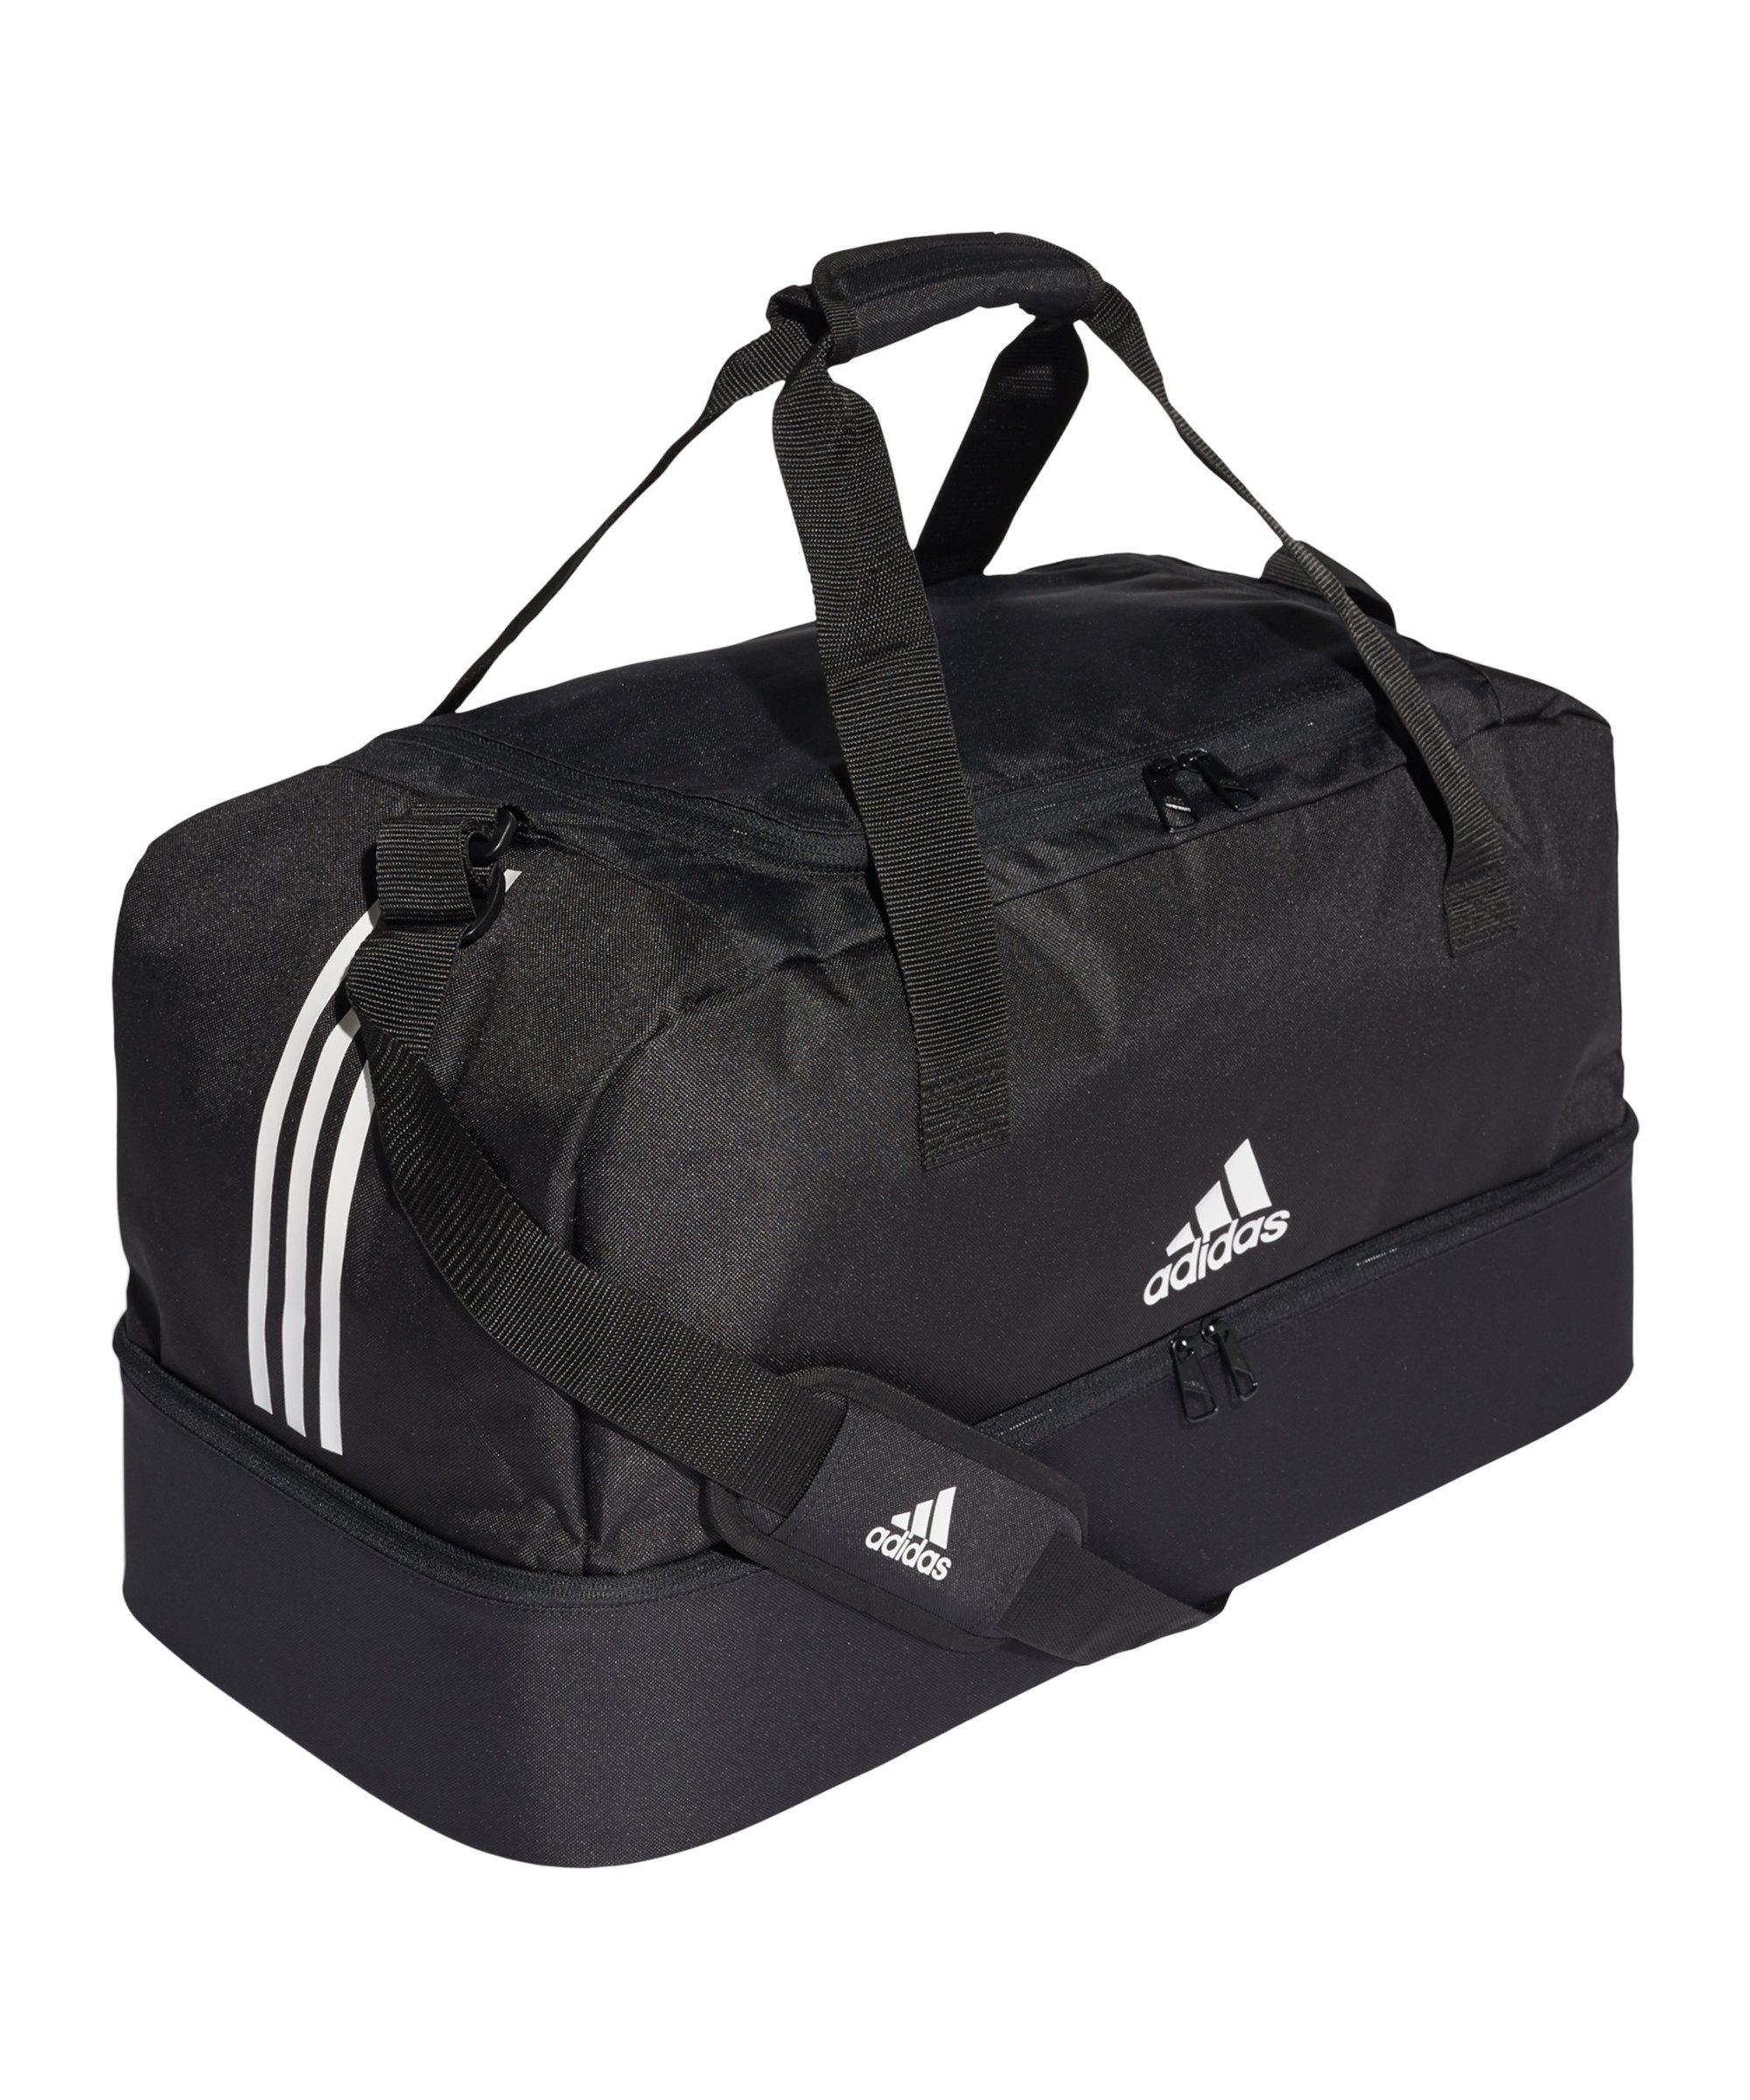 9b6392380517b adidas Tiro Duffel Bag Gr. M mit Bodenfach Schwarz - schwarz